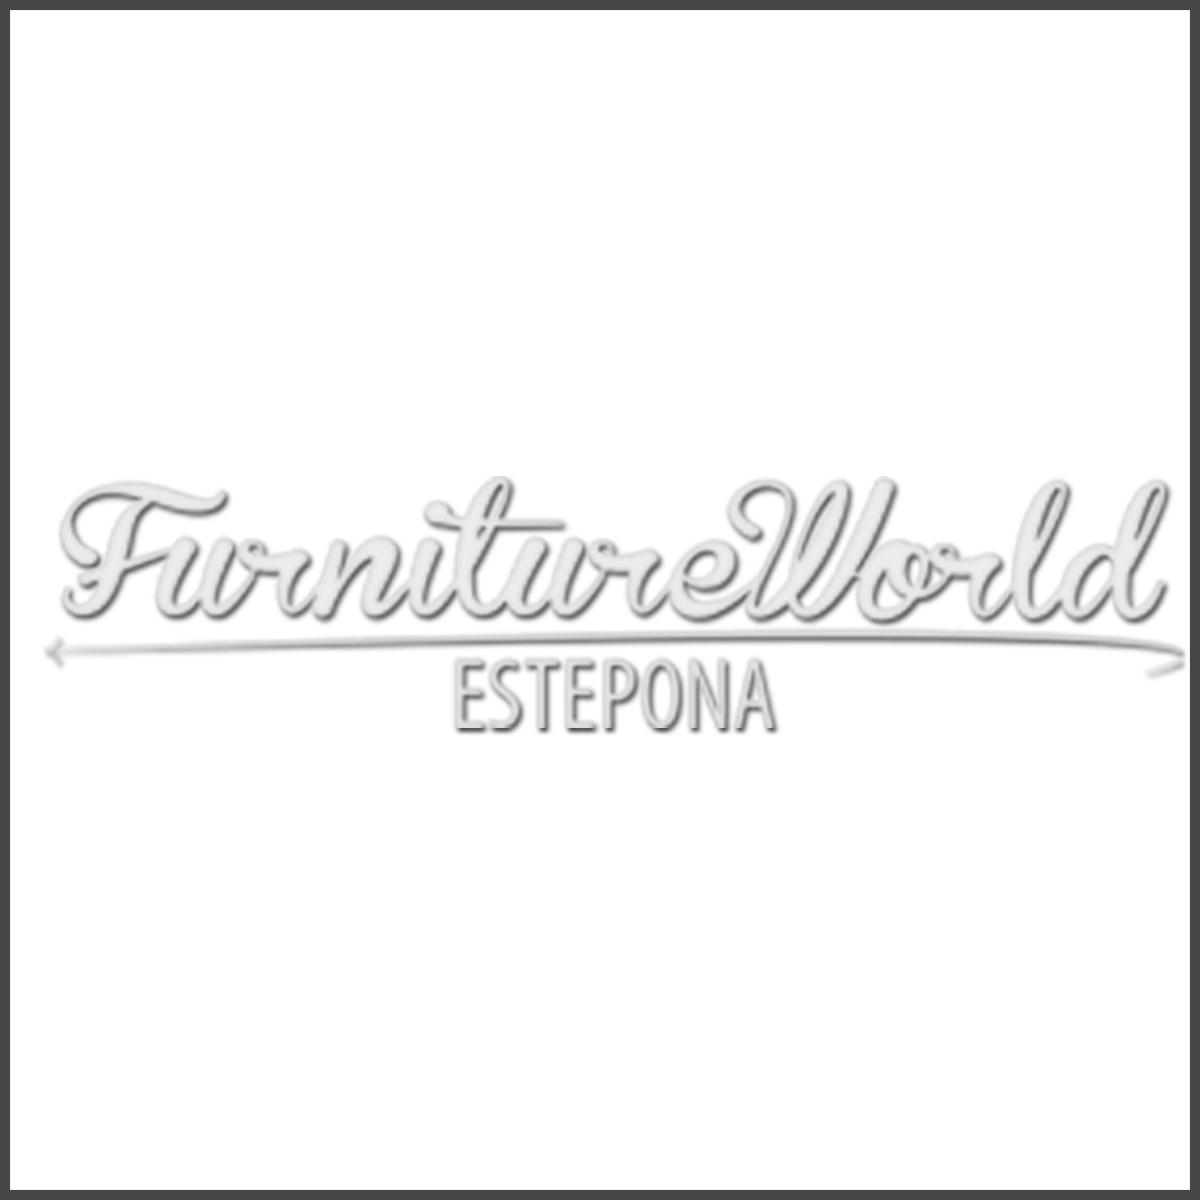 Logo-Estepona-Furniture Mantenimiento a Empresas